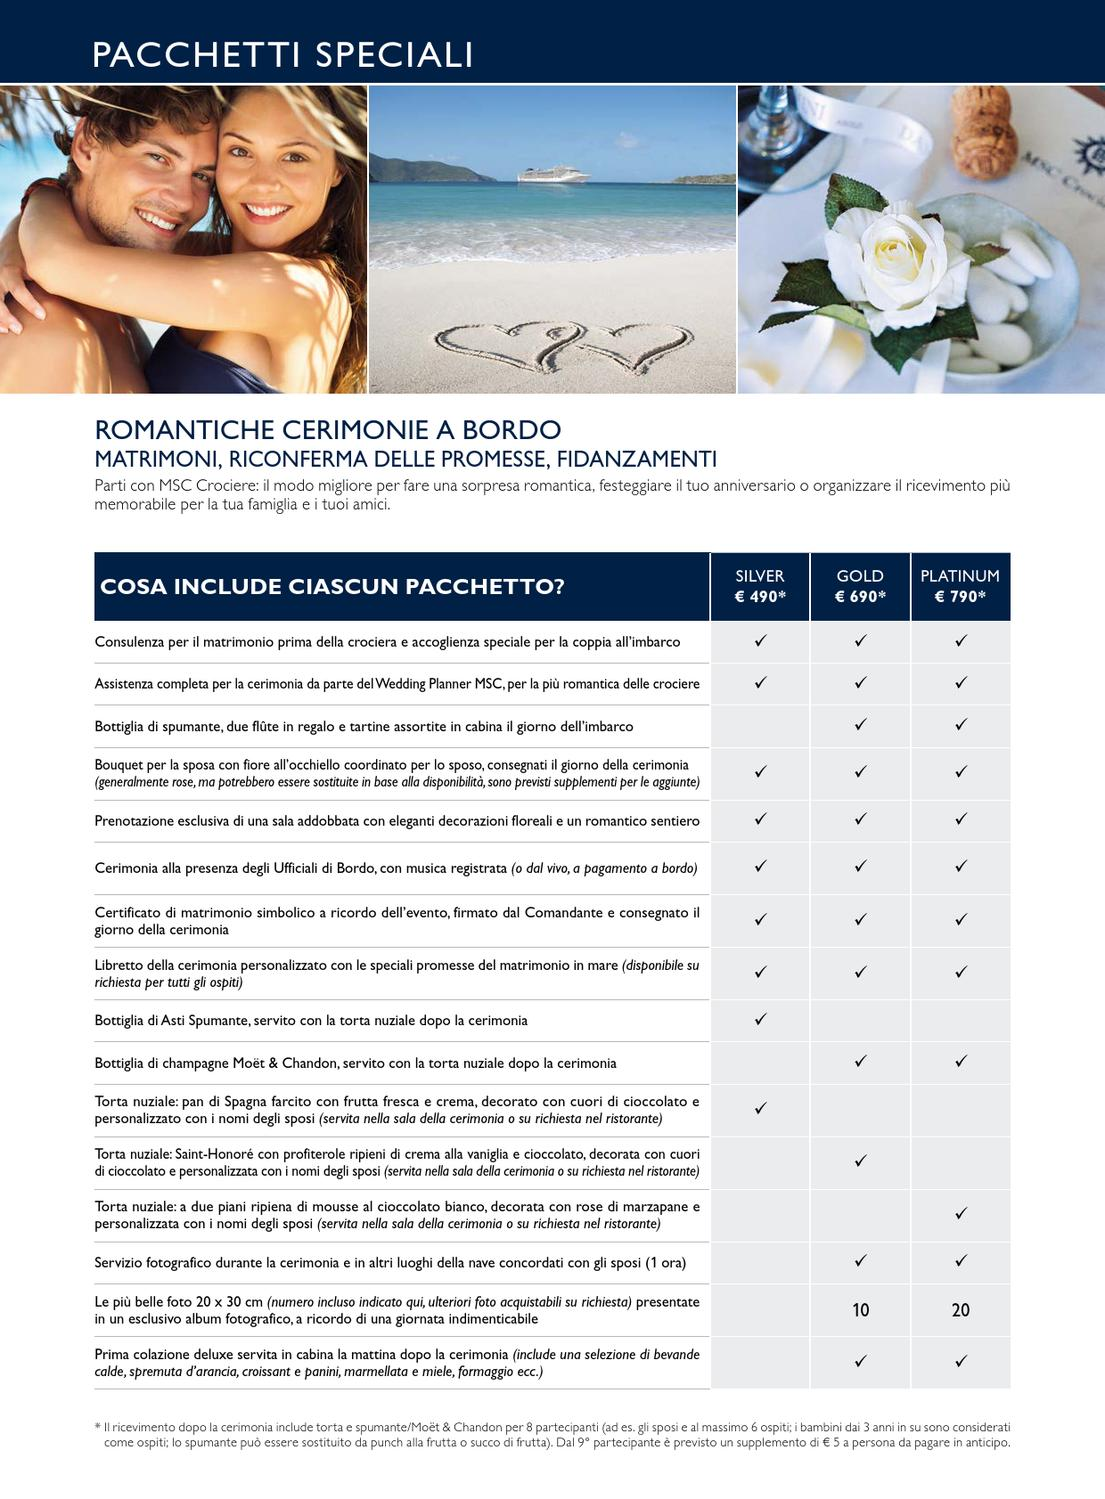 Anniversario Matrimonio Msc.Msc 2012 2013 By Daniele Villante Issuu